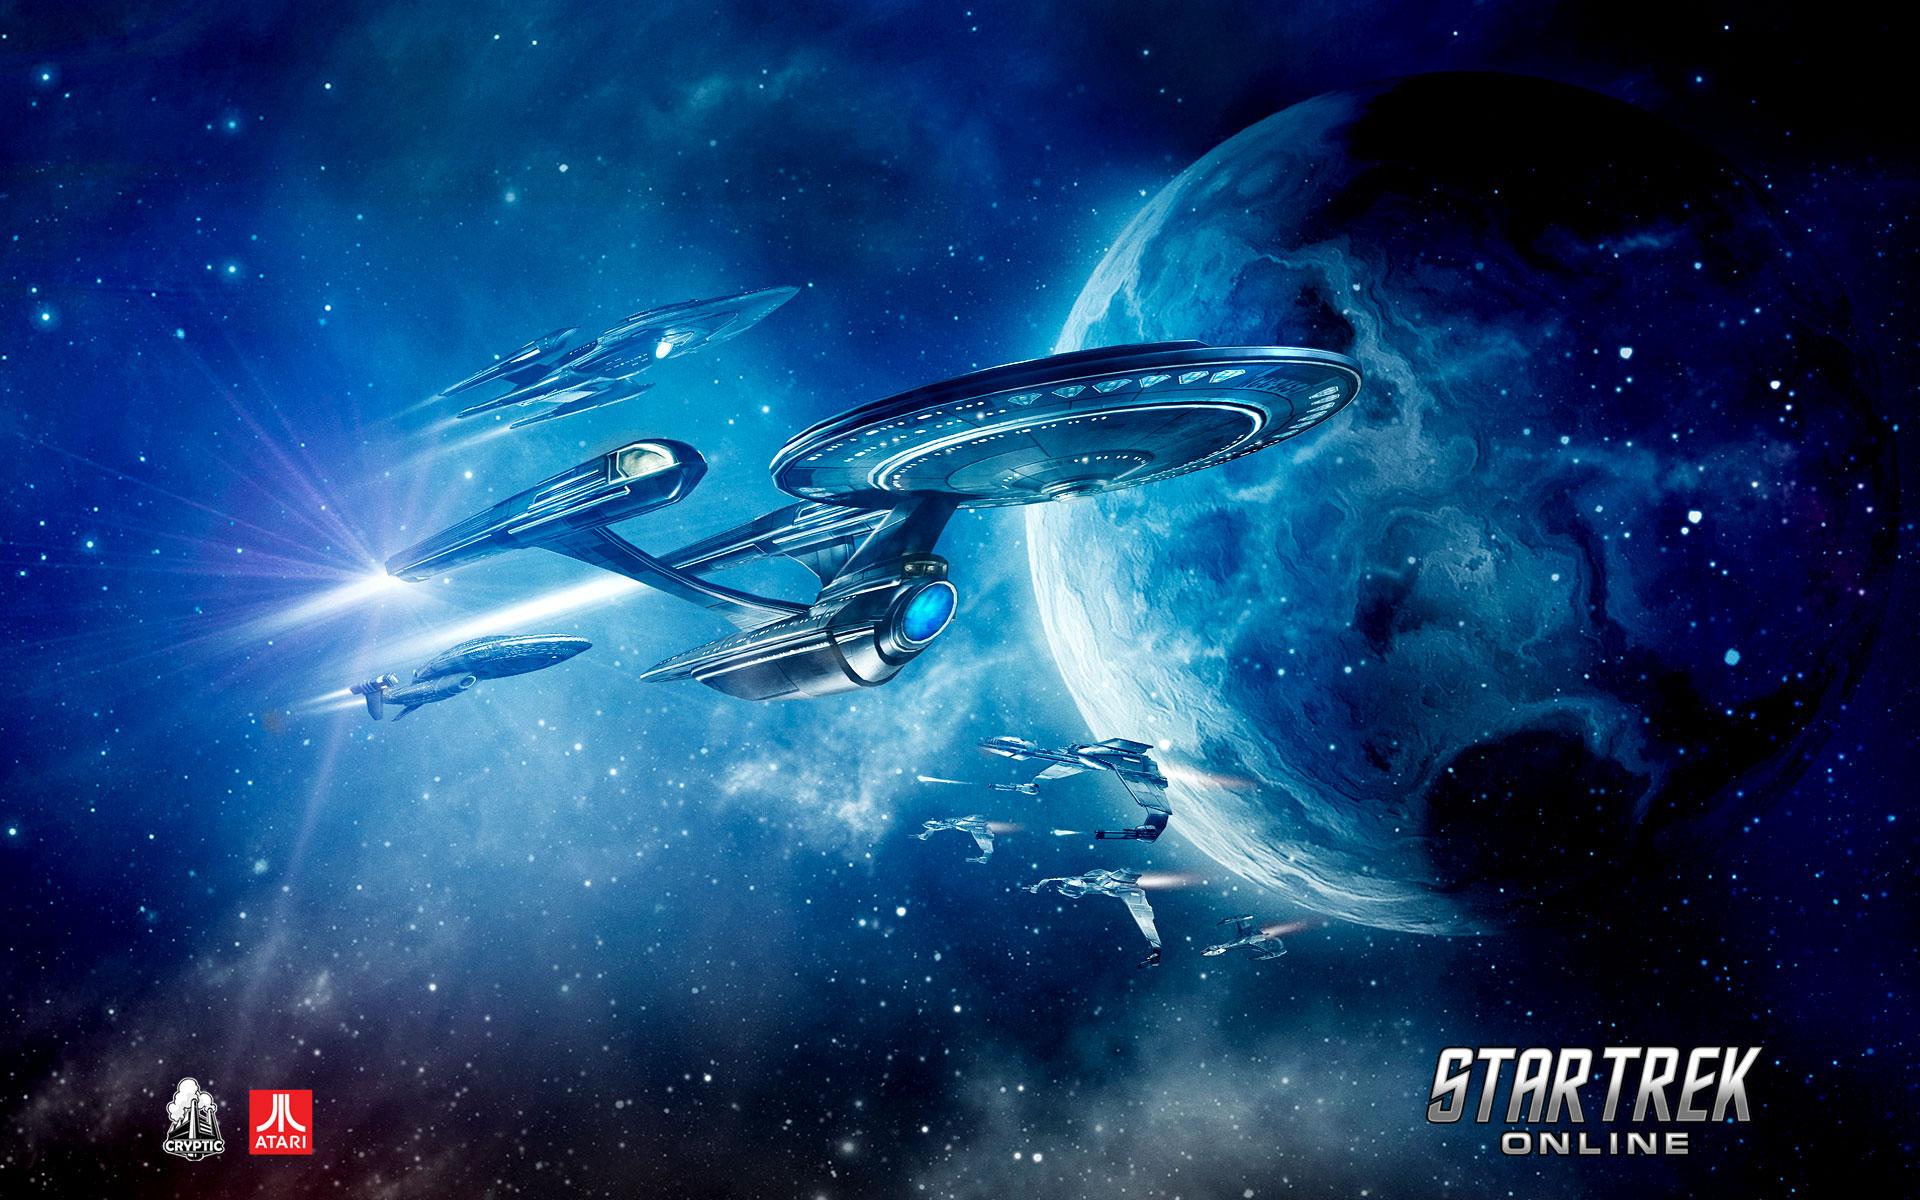 Star Trek Wallpaper HD 1080p ImageBankbiz 1920x1200